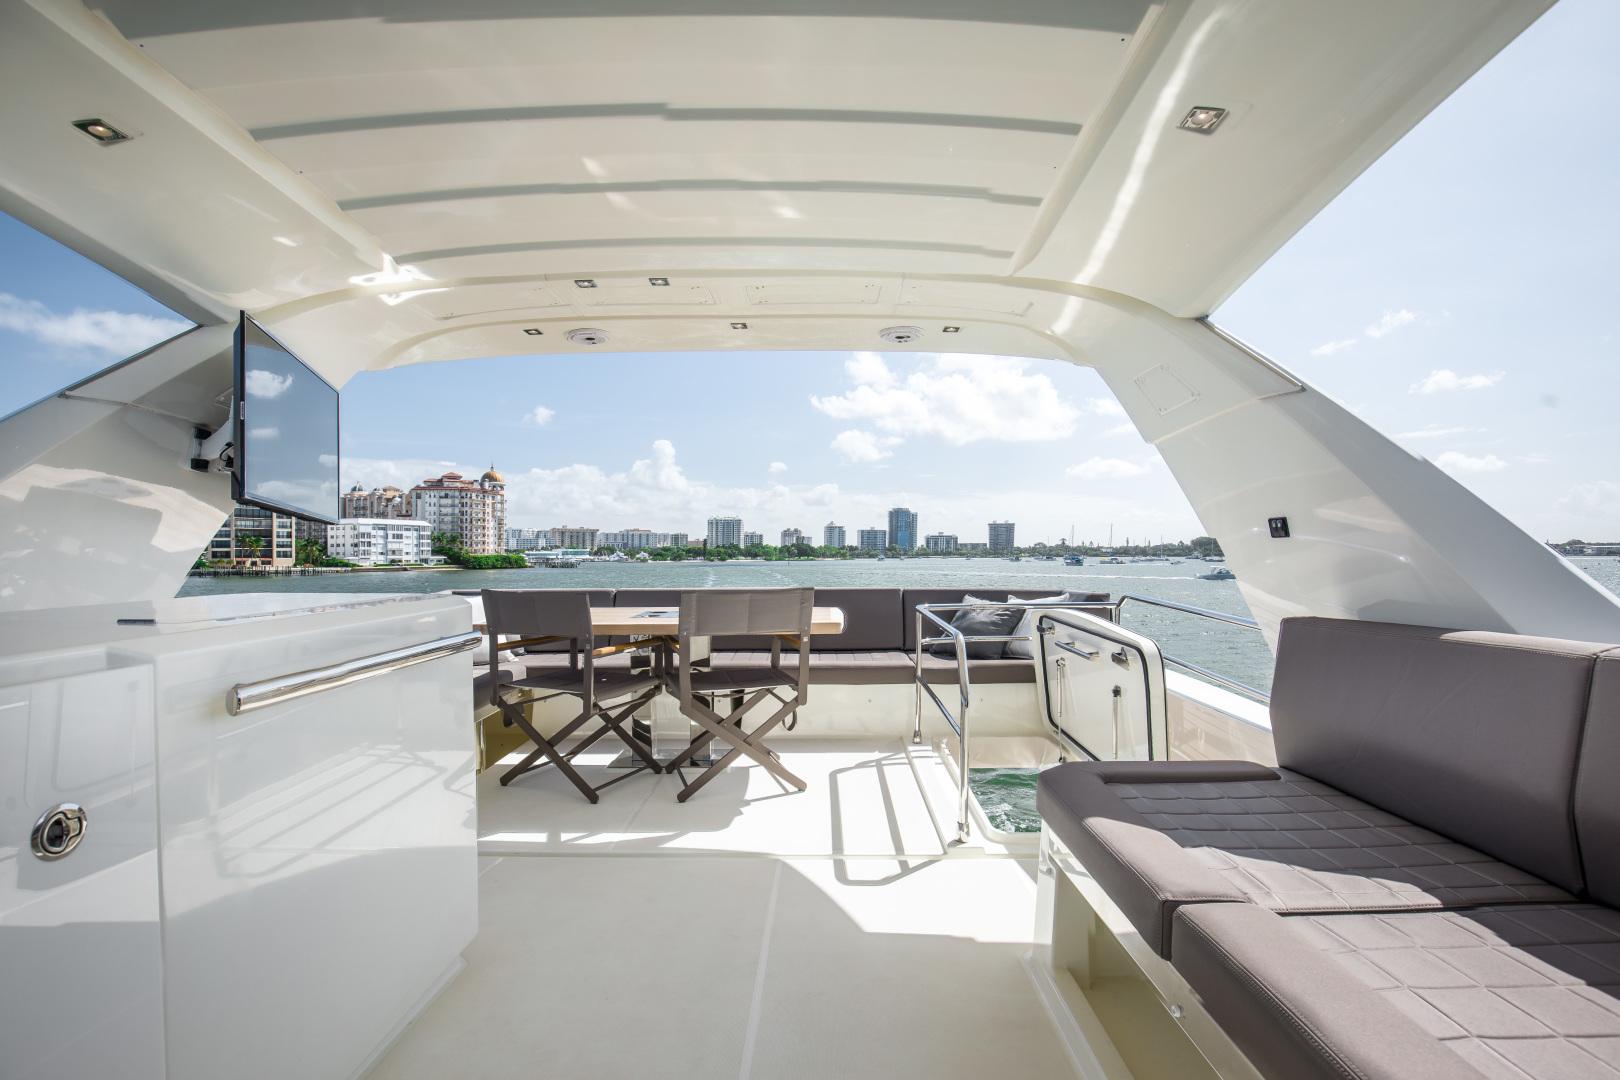 Prestige-680 Flybridge 2018-Seduction Sarasota-Florida-United States-2018 68 Prestige 680 Flybridge  Flybridge-1498999 | Thumbnail